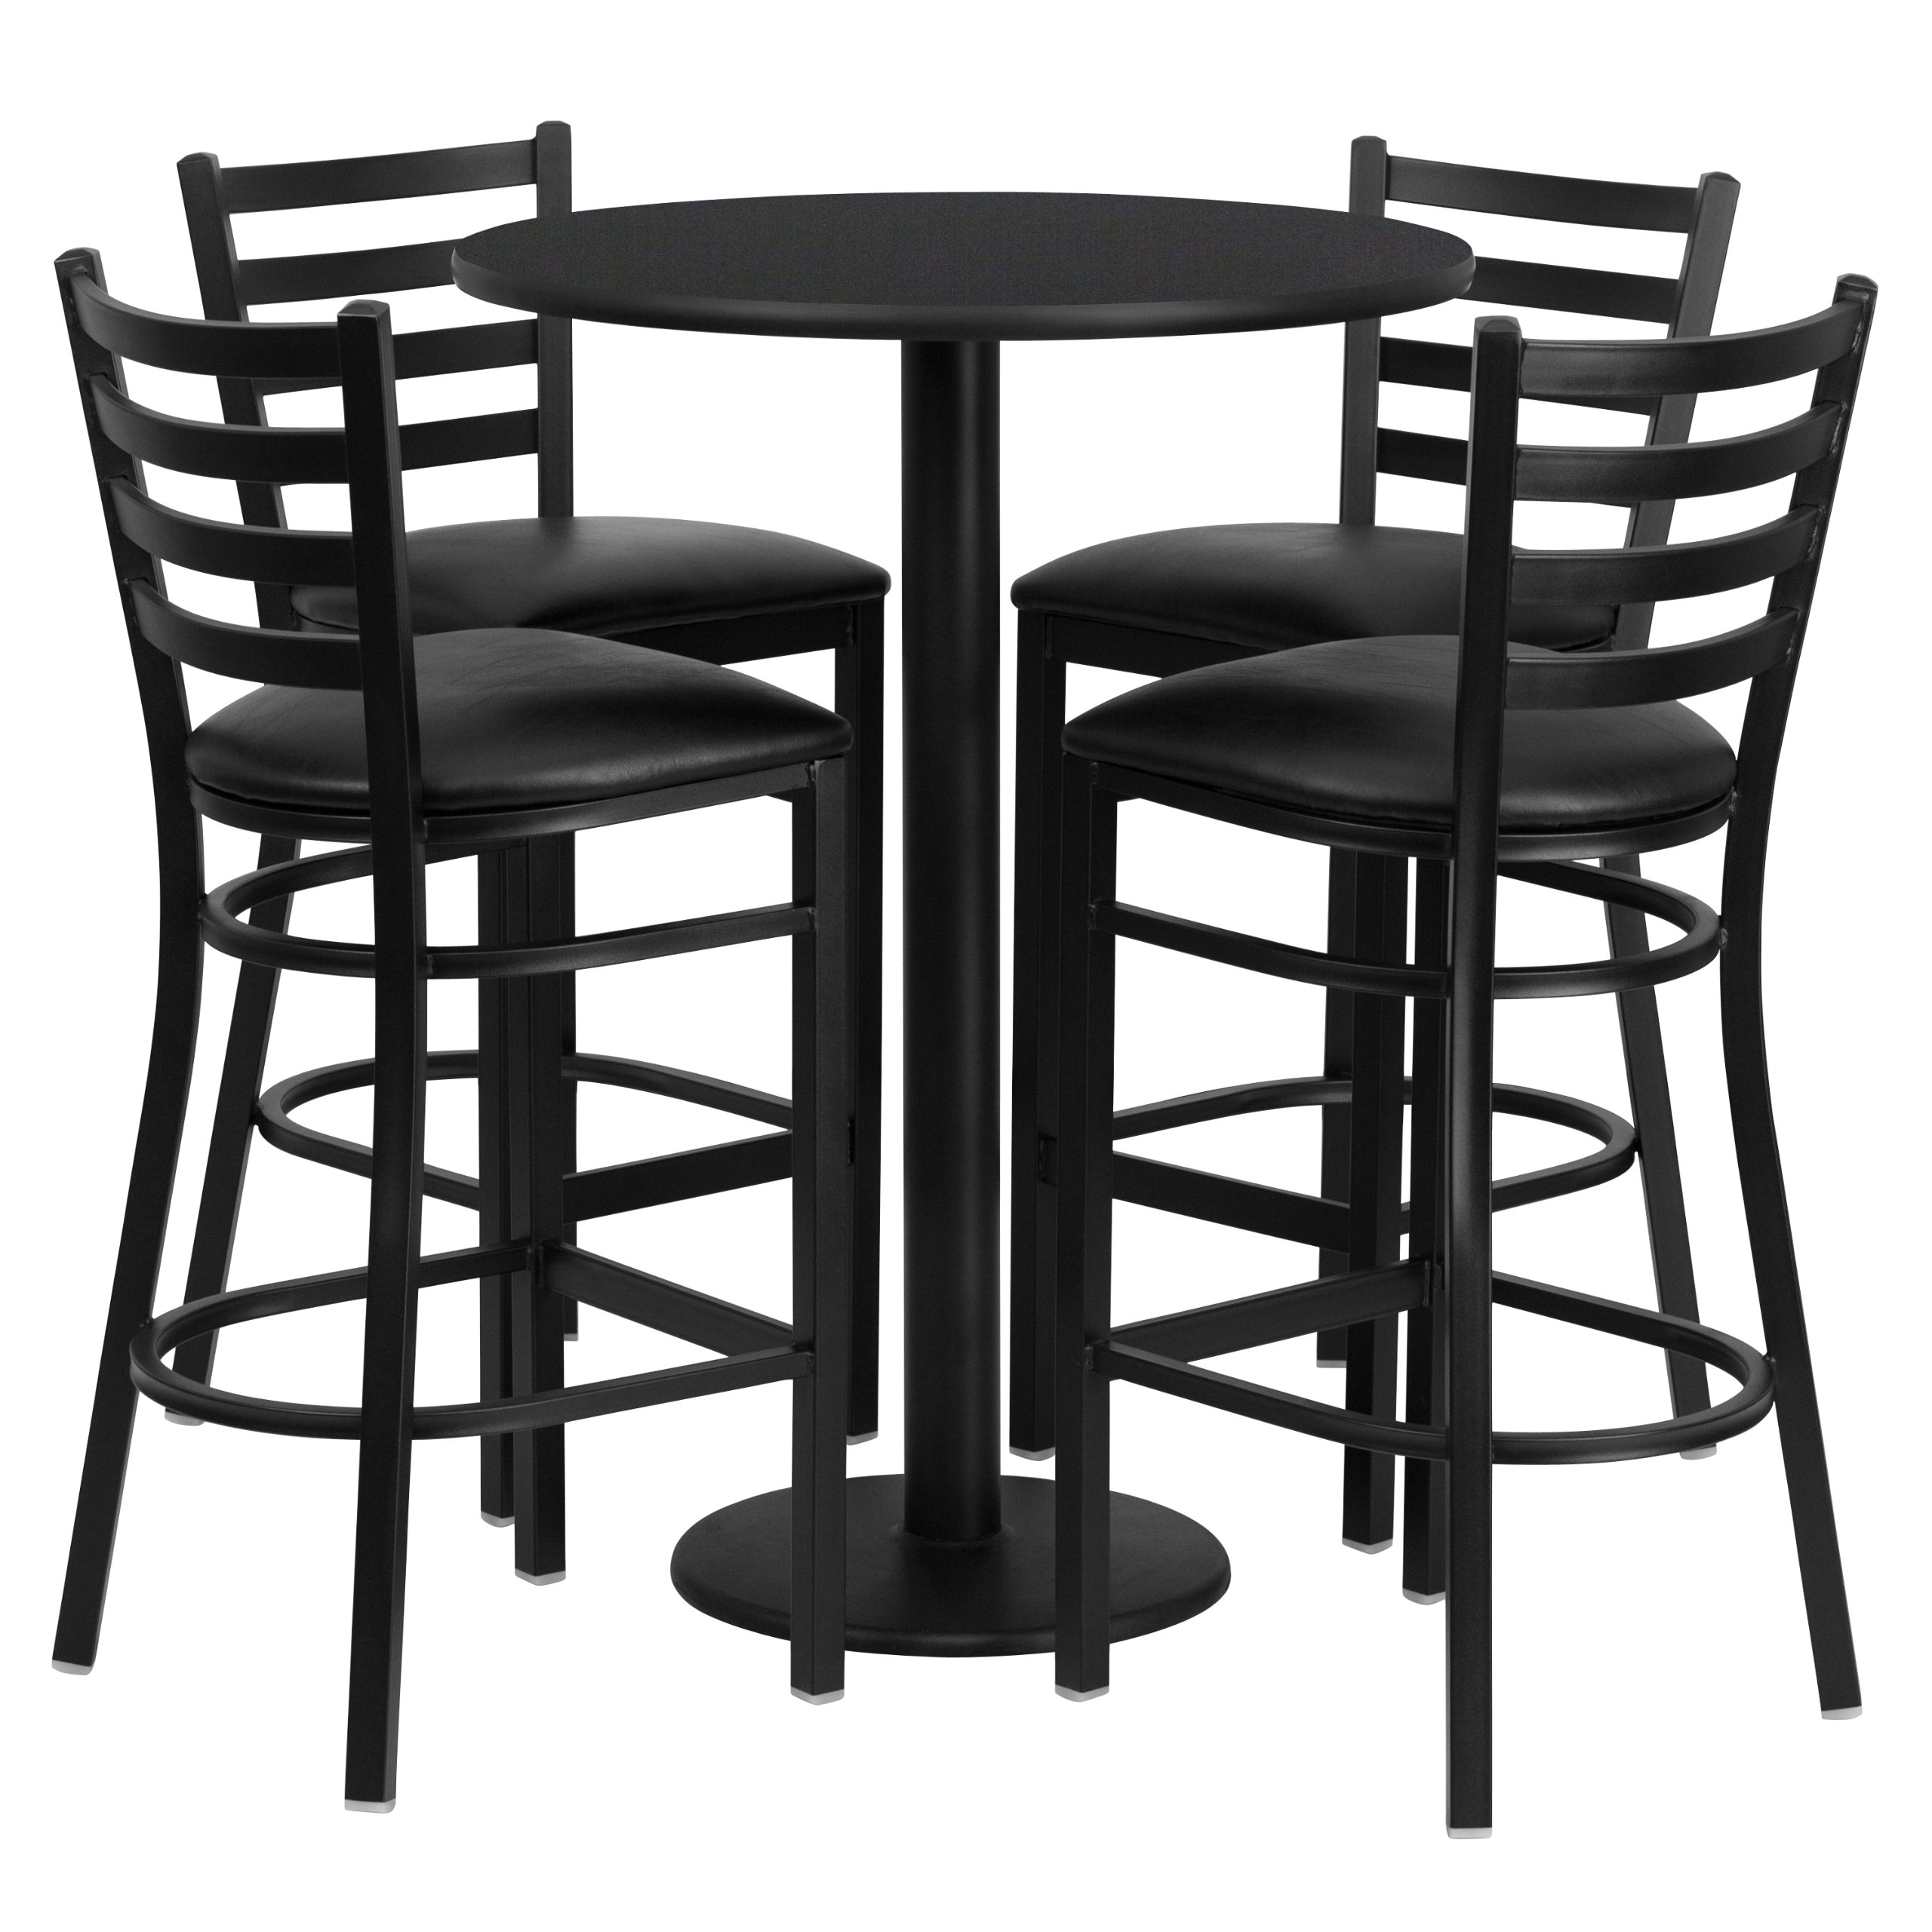 Flash Furniture 30u0027u0027 Round Black Laminate Table Set with 4 Ladder Back Metal Barstools  sc 1 st  Amazon.com & Restaurant Tables and Chairs: Amazon.com